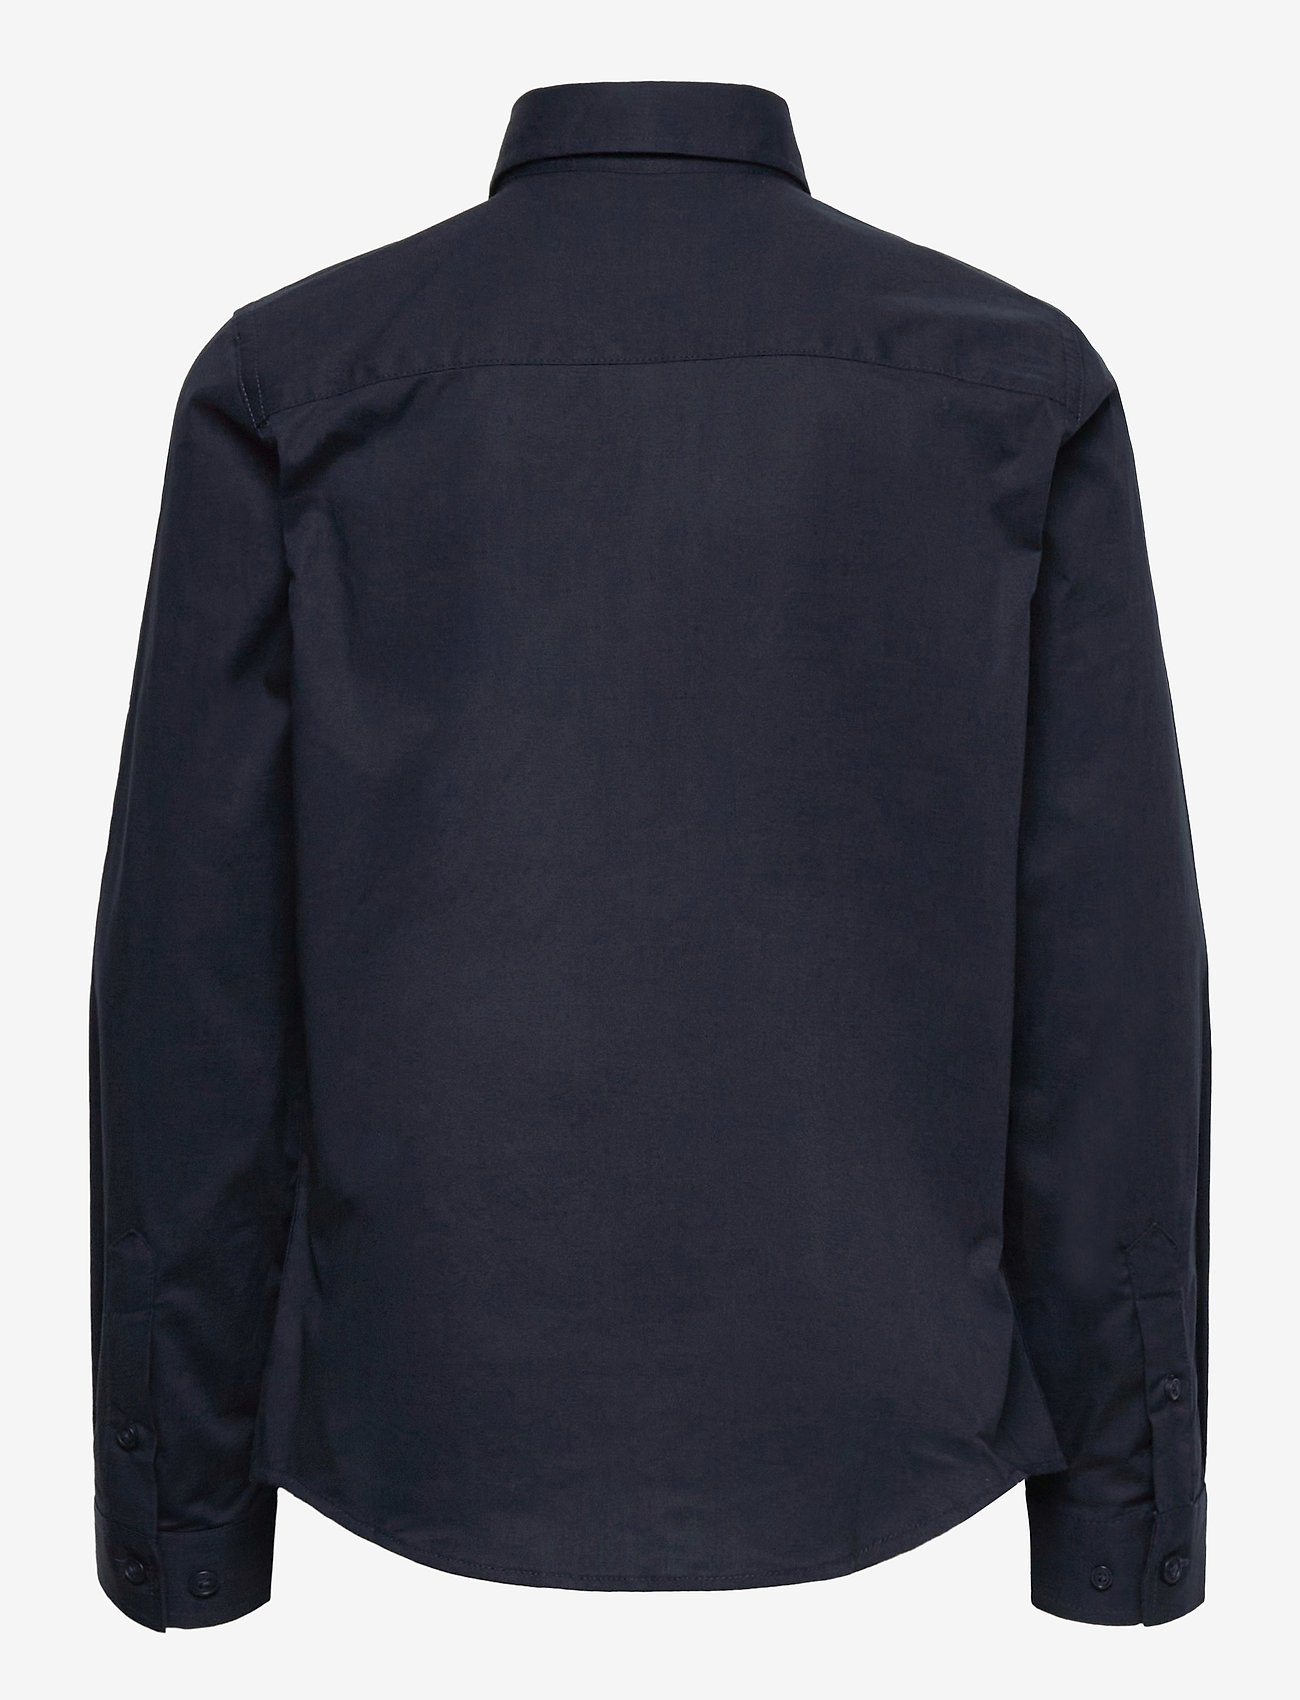 Jack & Jones - JJEMASON STRETCH SHIRT L/S ES21 JR - shirts - navy blazer - 1